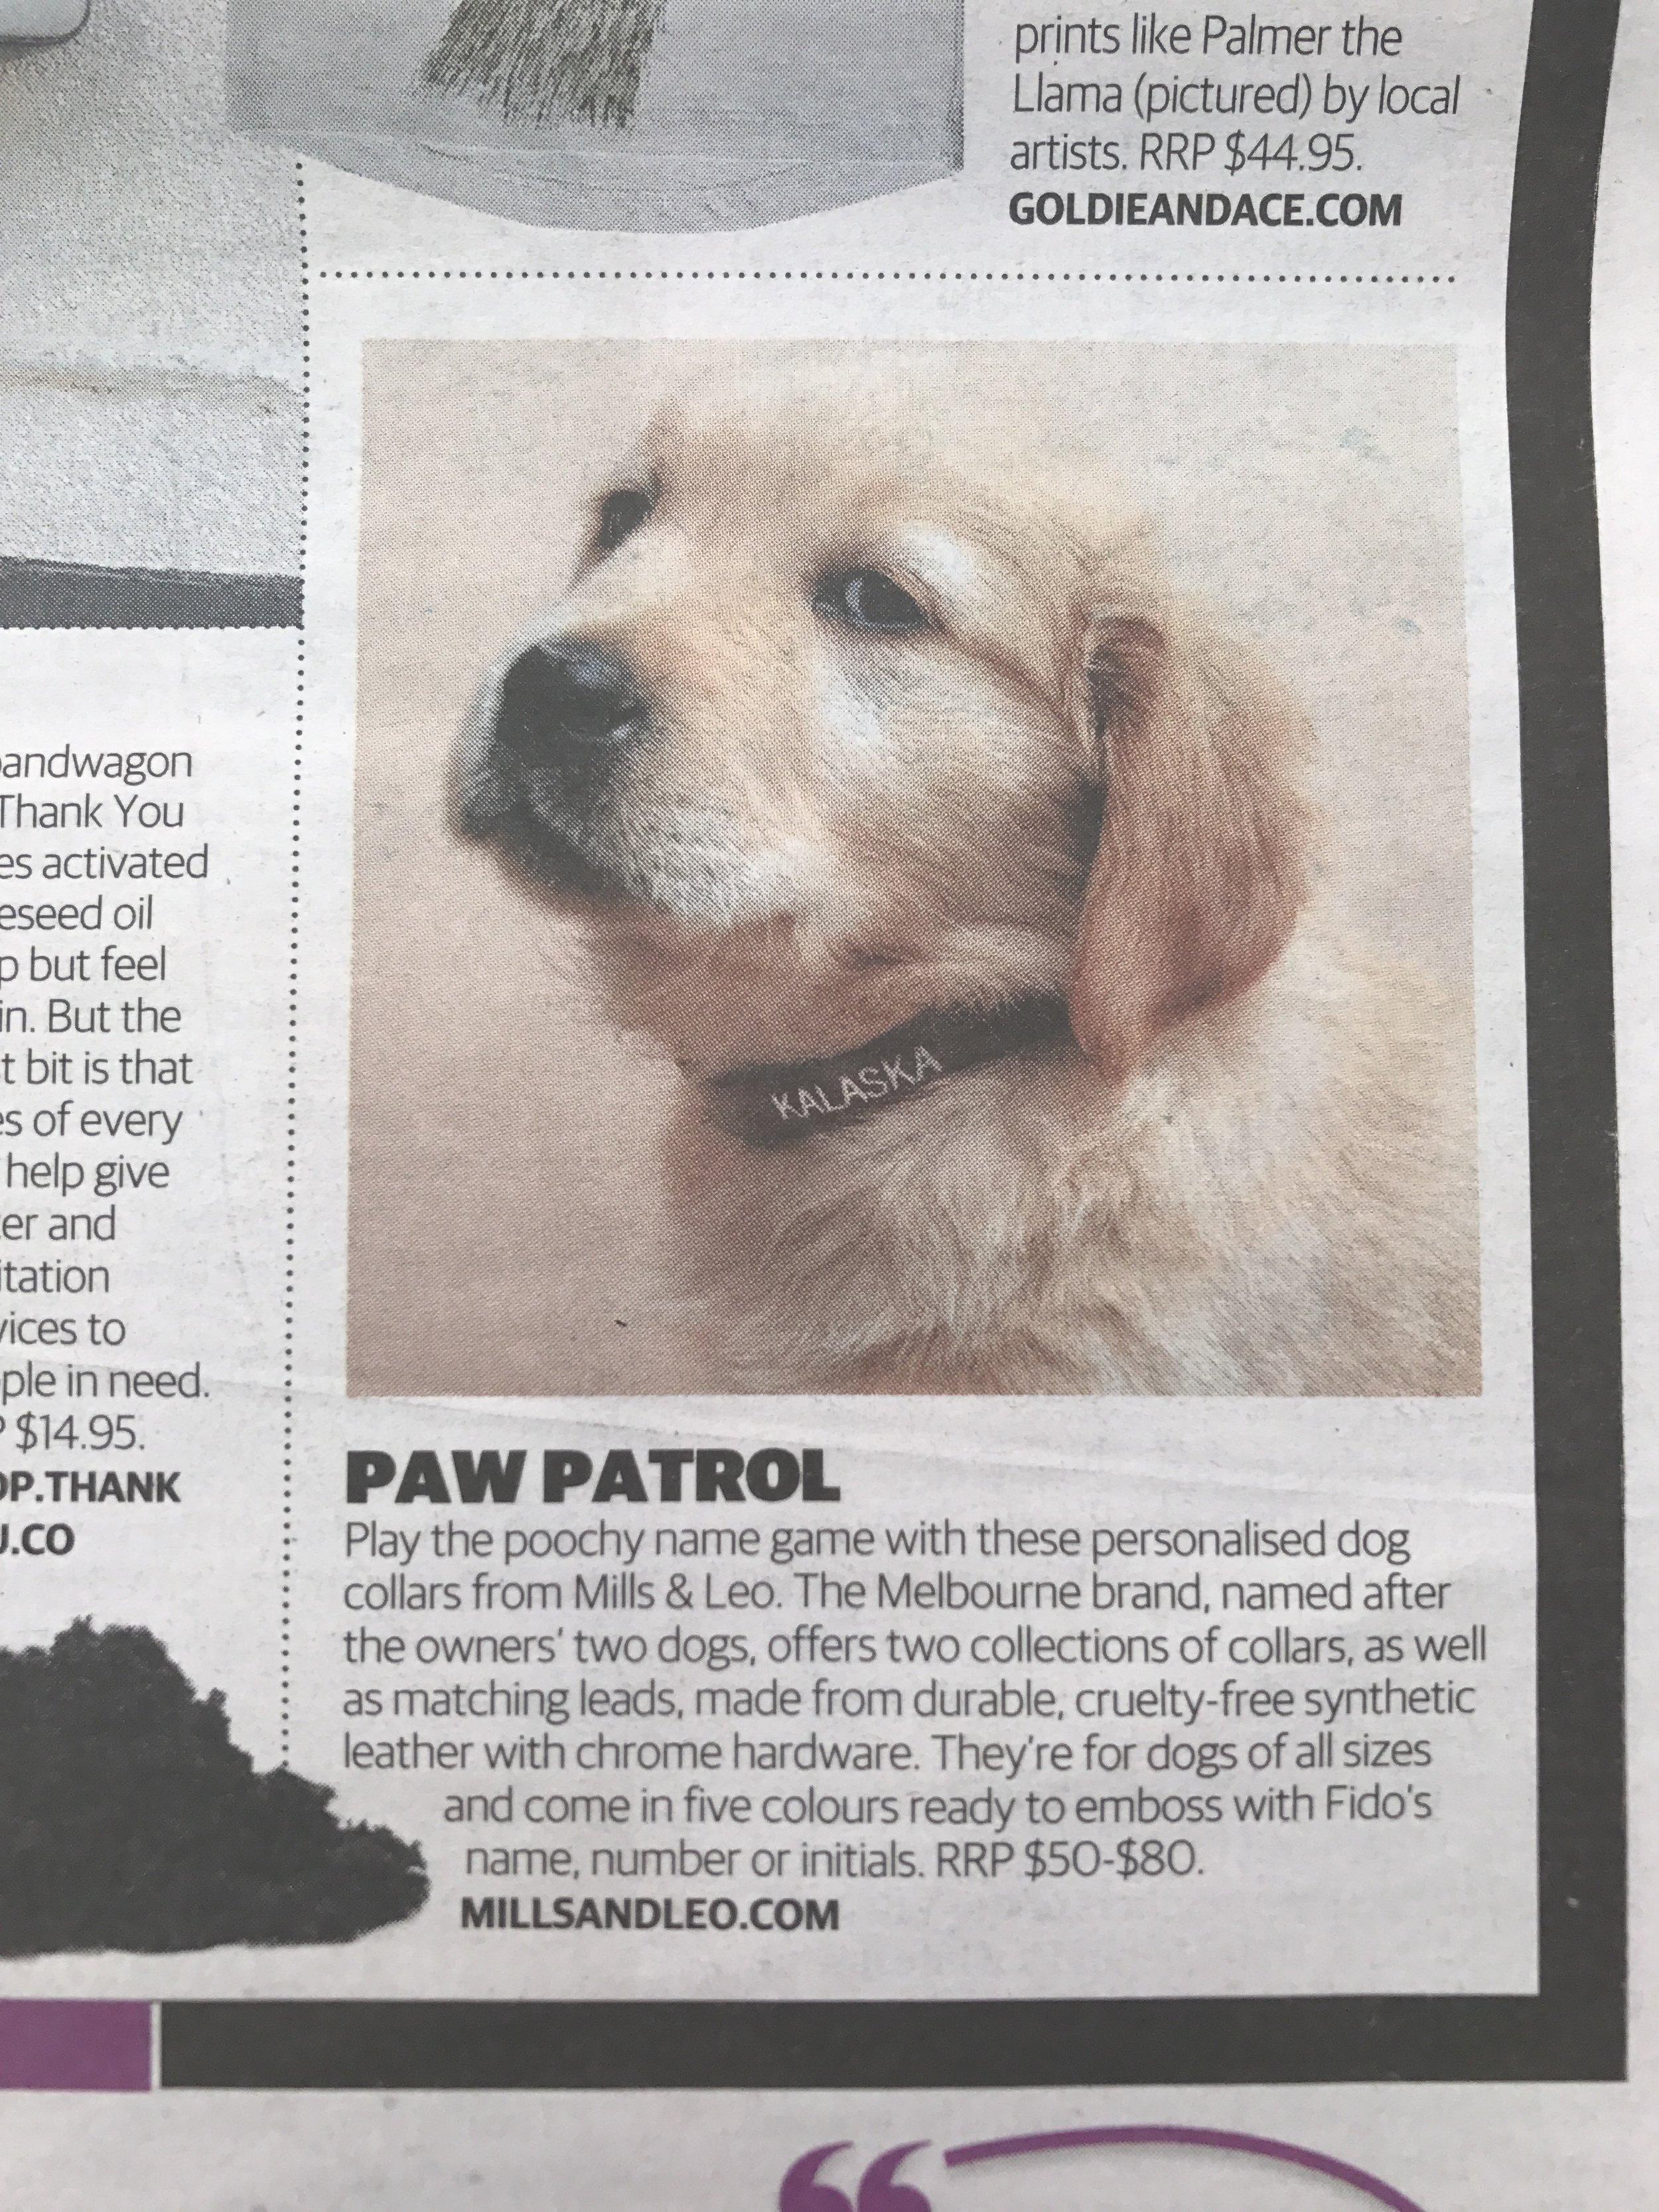 mills&LEO in The Herald Sun newspaper